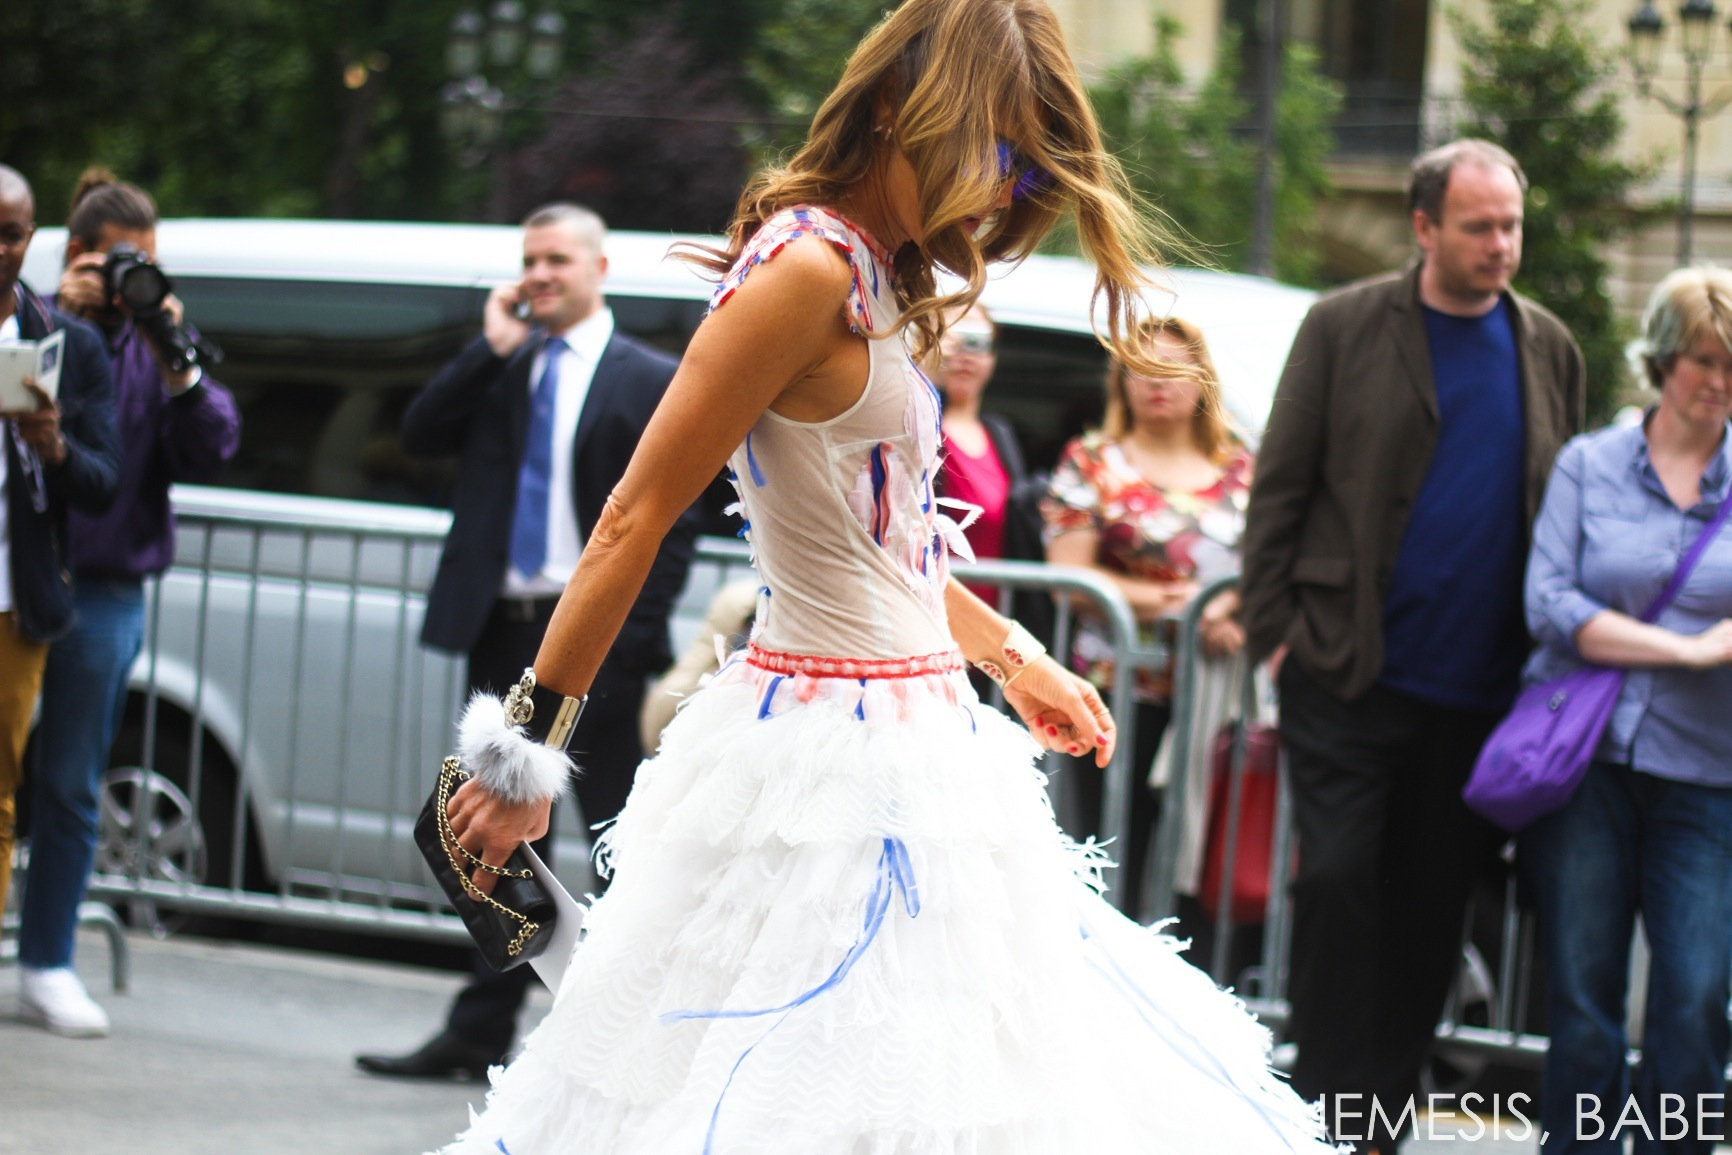 paris haute couture street style day 2 nemesis babe-23